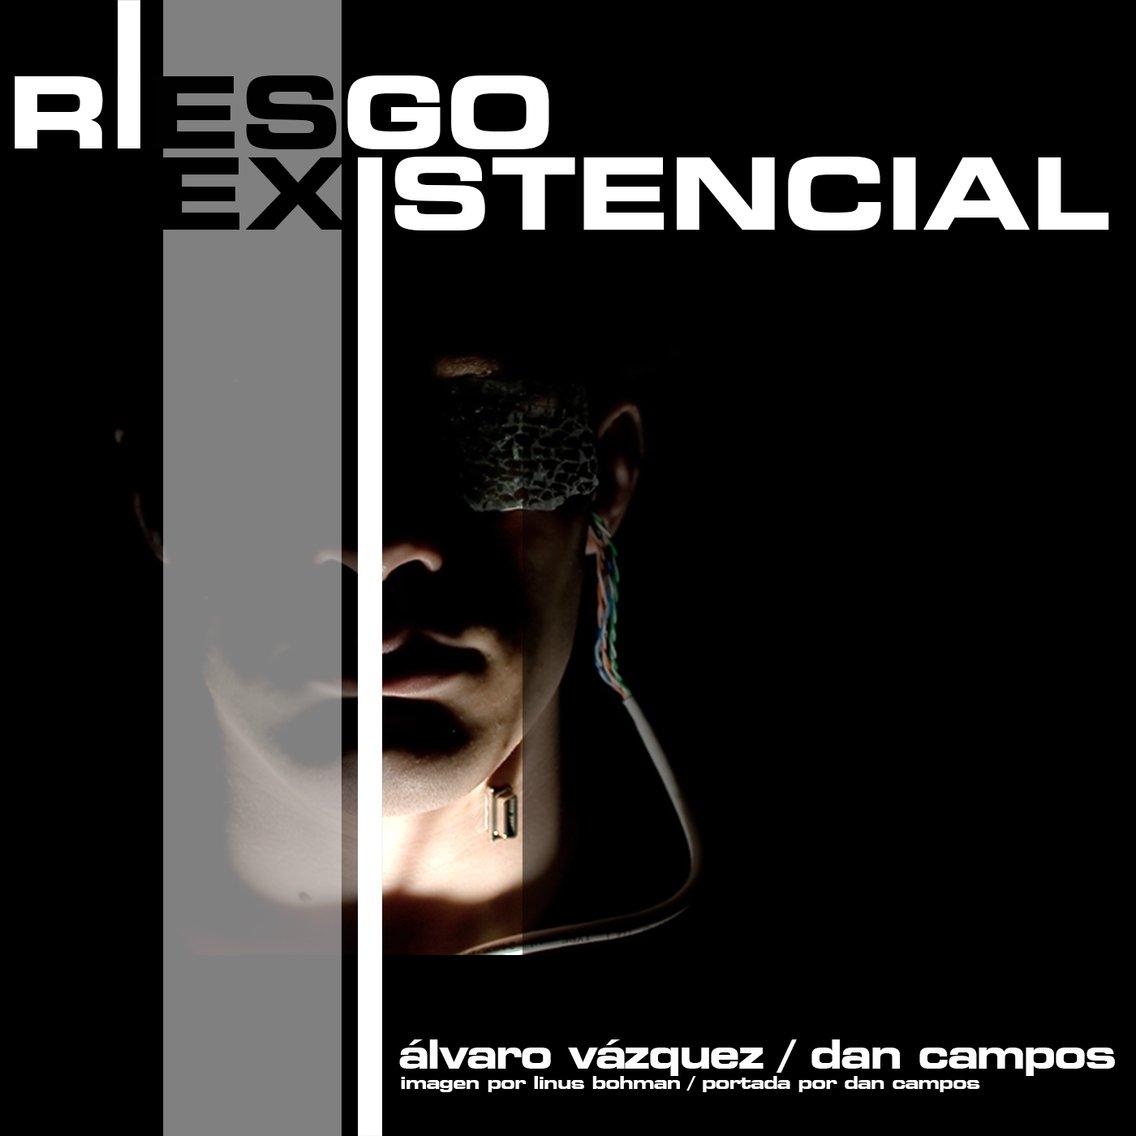 Riesgo Existencial - imagen de portada